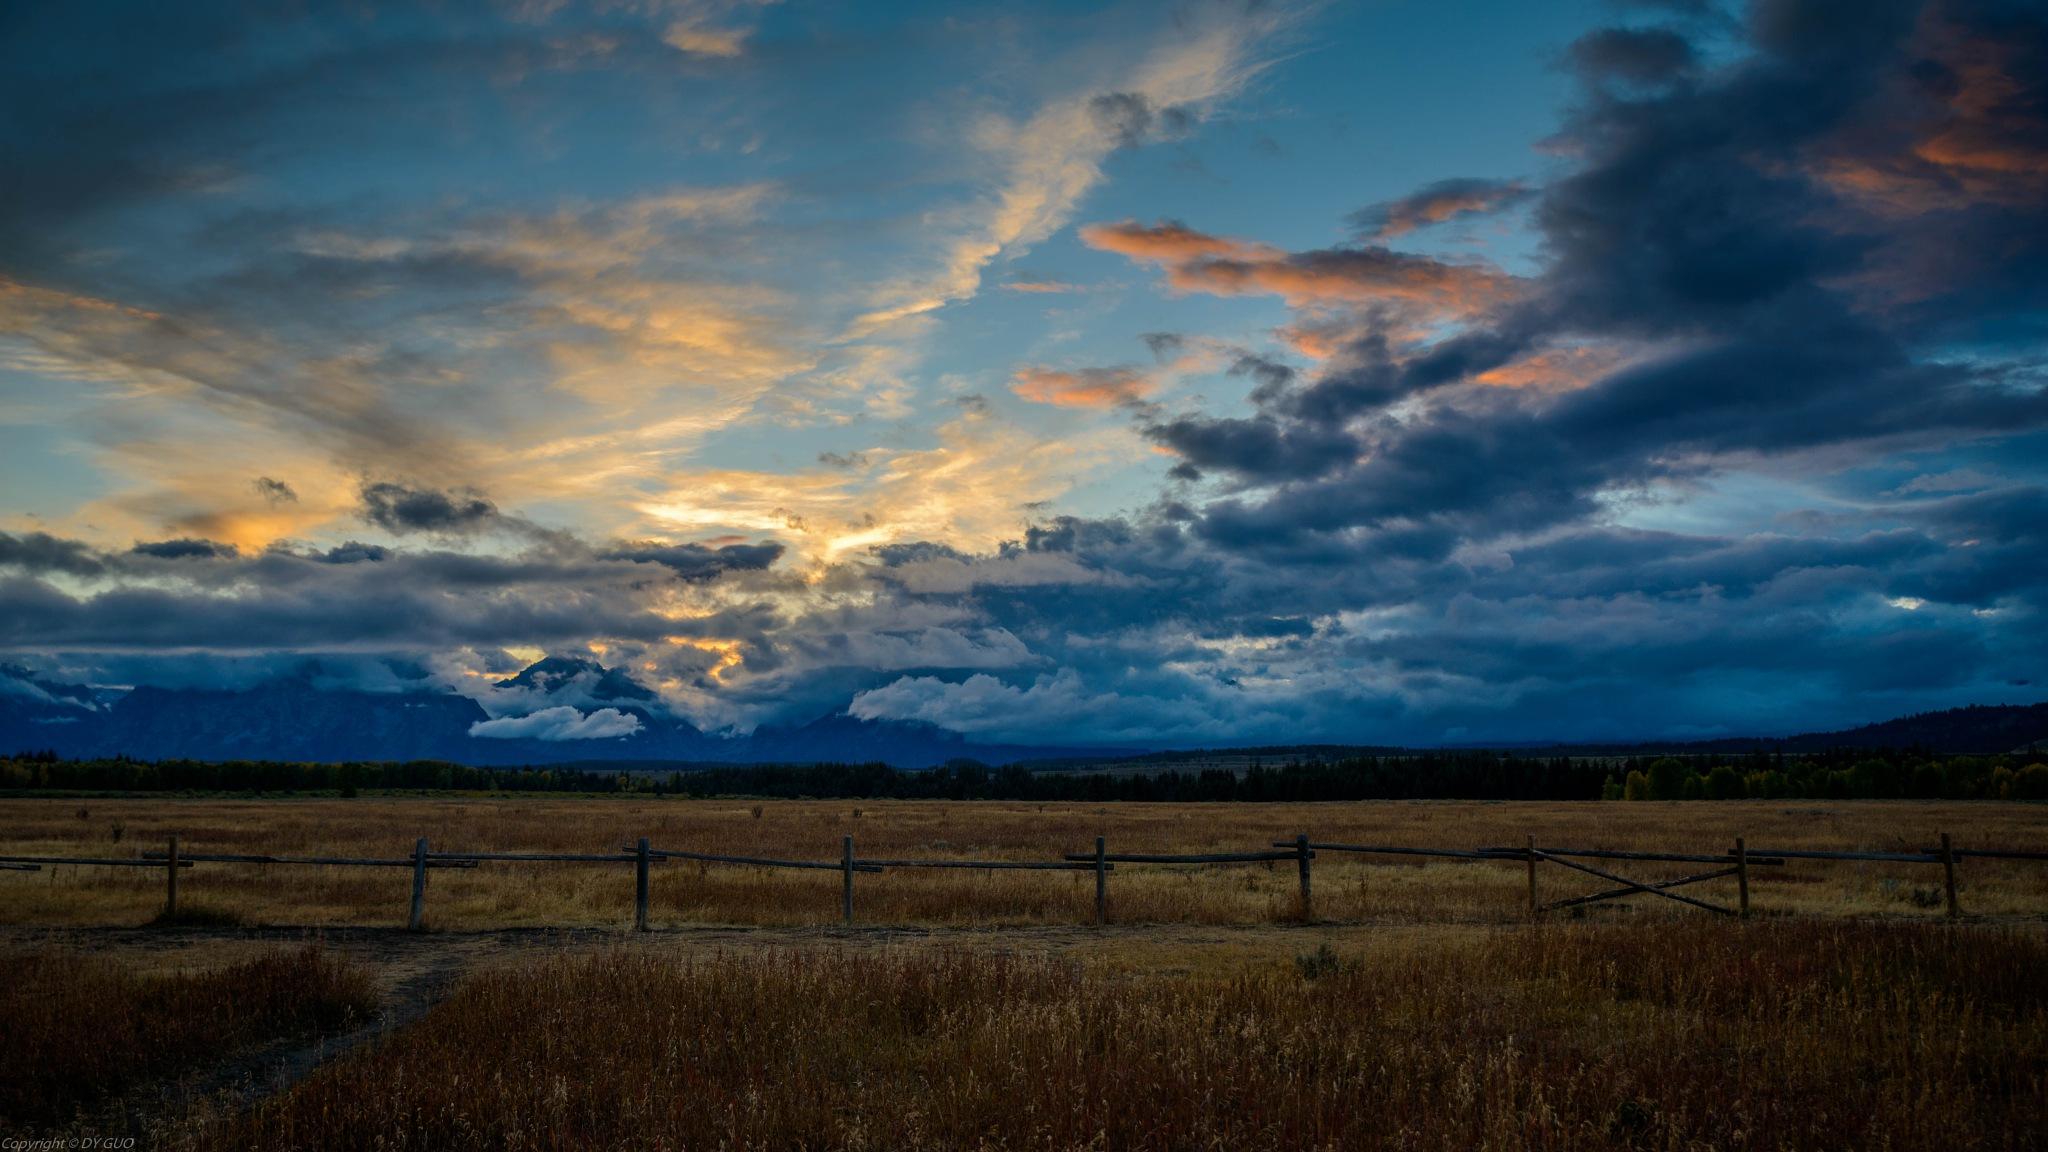 Grand Teton at sunset by David Guo